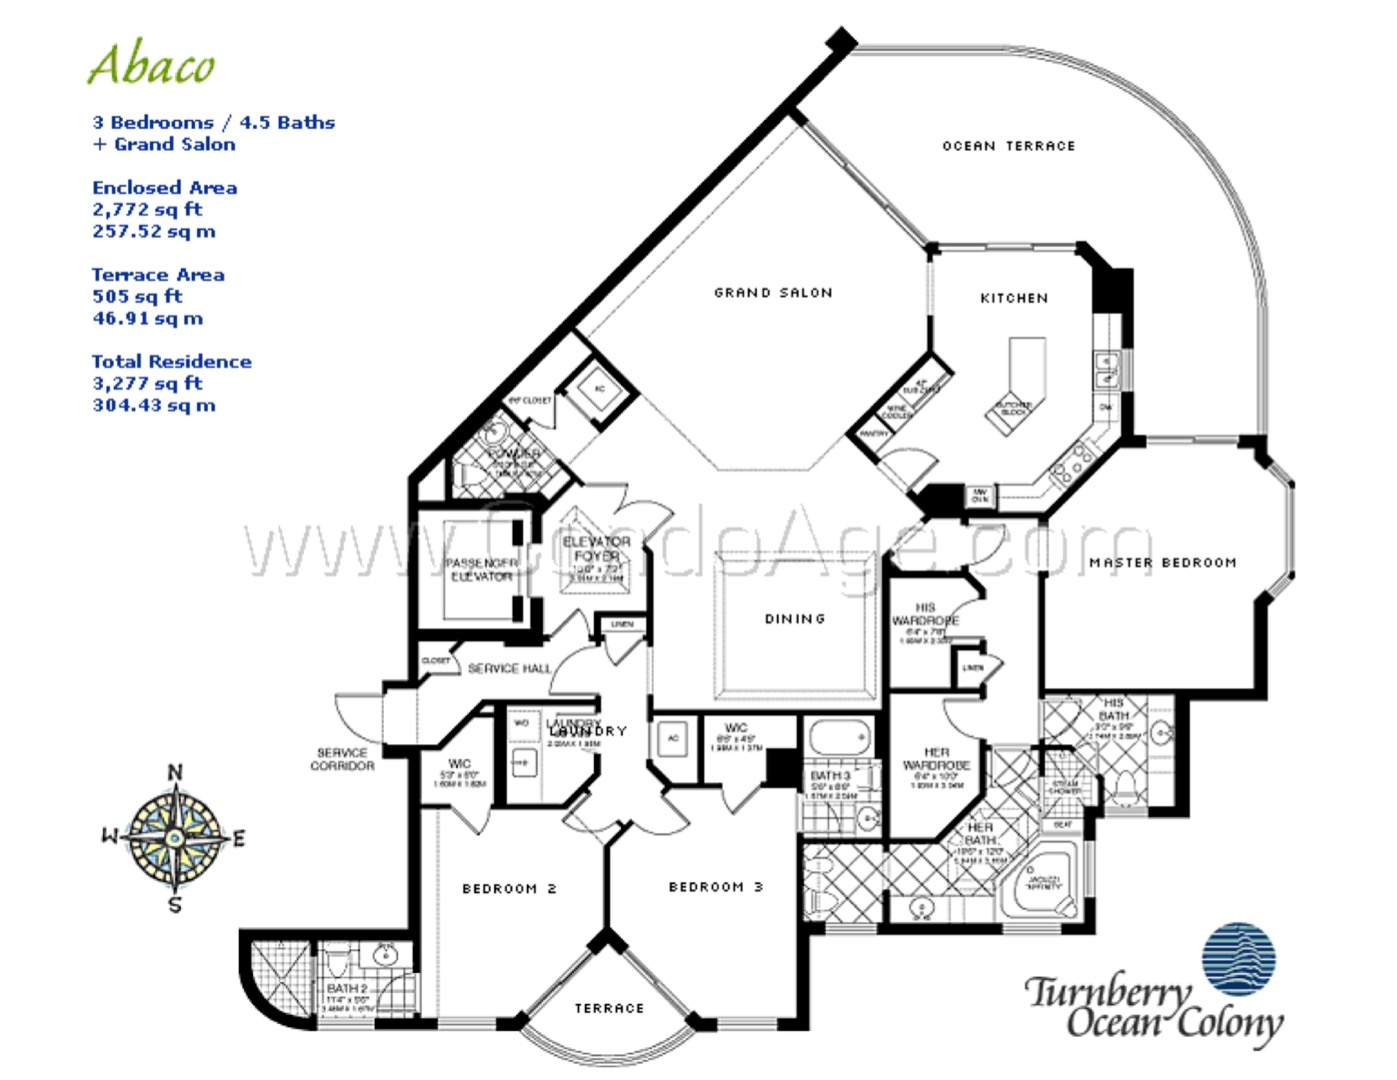 Floor plan image Abaco - 3/4/1  - 2772 sqft image